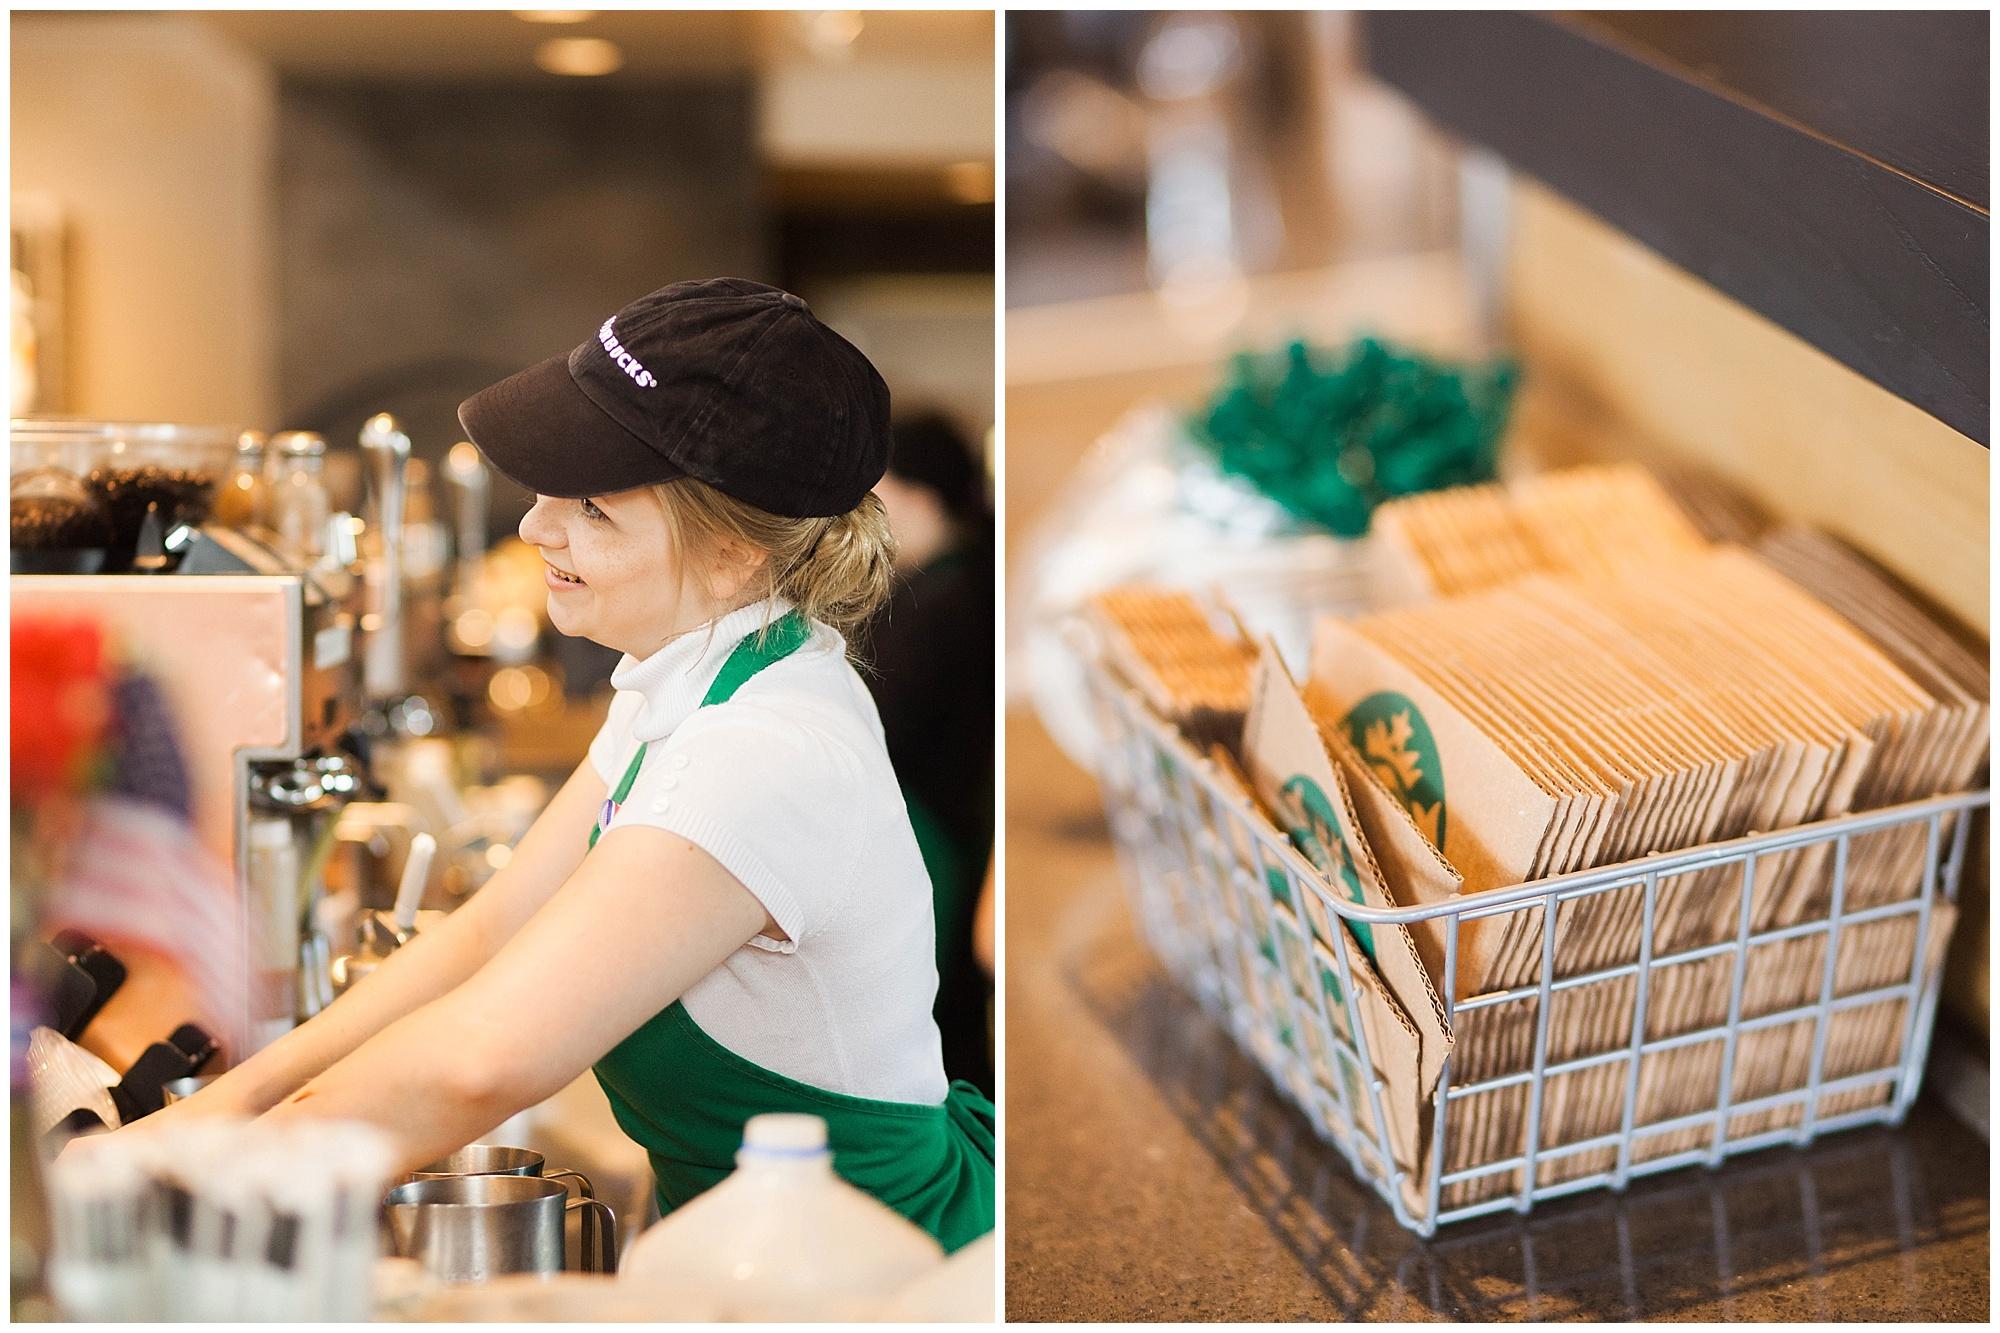 Starbucks Coffee | Commercial Photographer